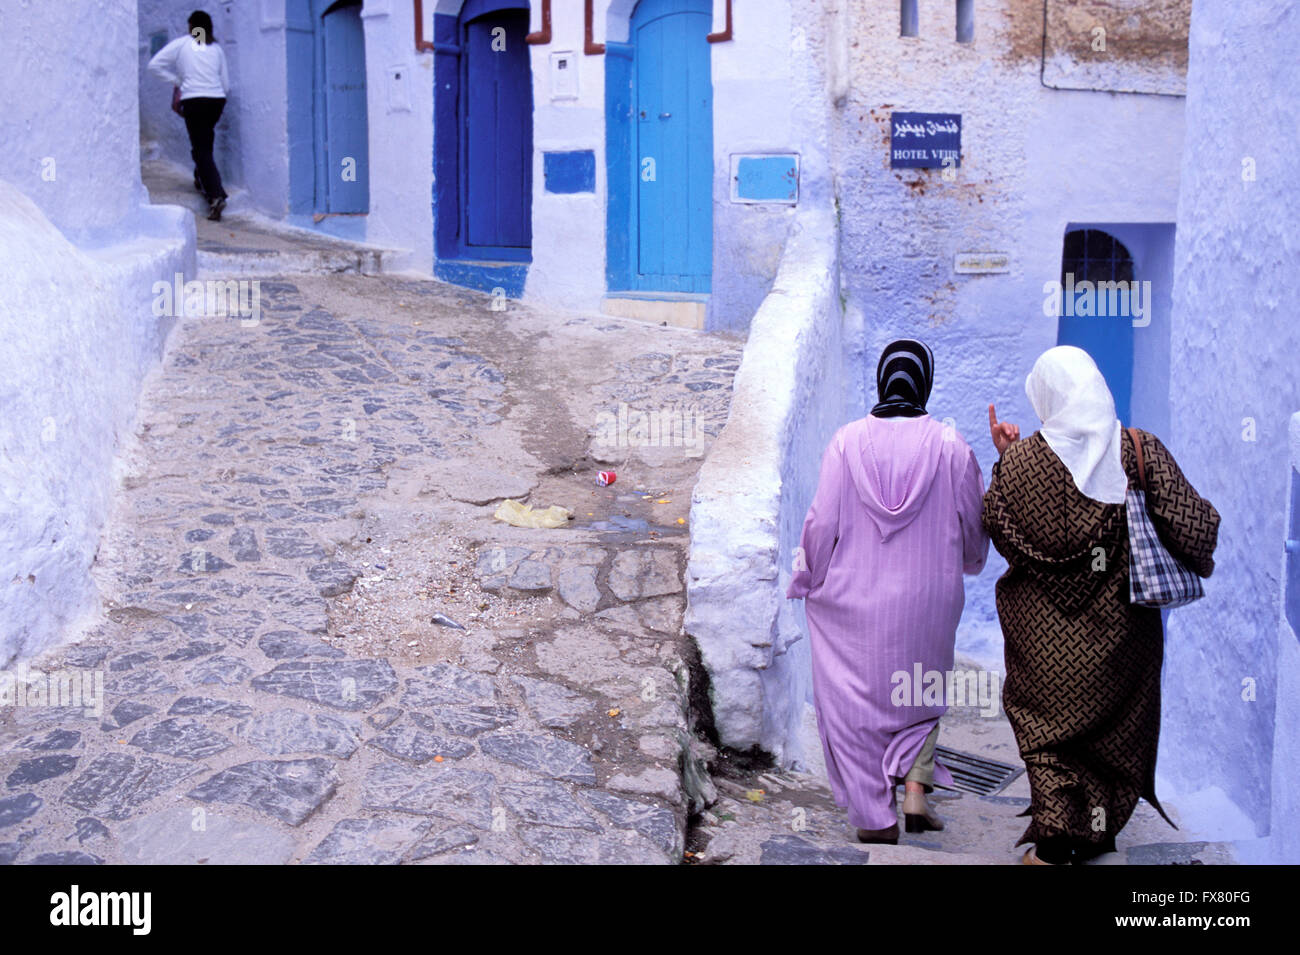 Marruecos Chefchaouen, la ciudad azul, Rif, Mujeres Foto de stock